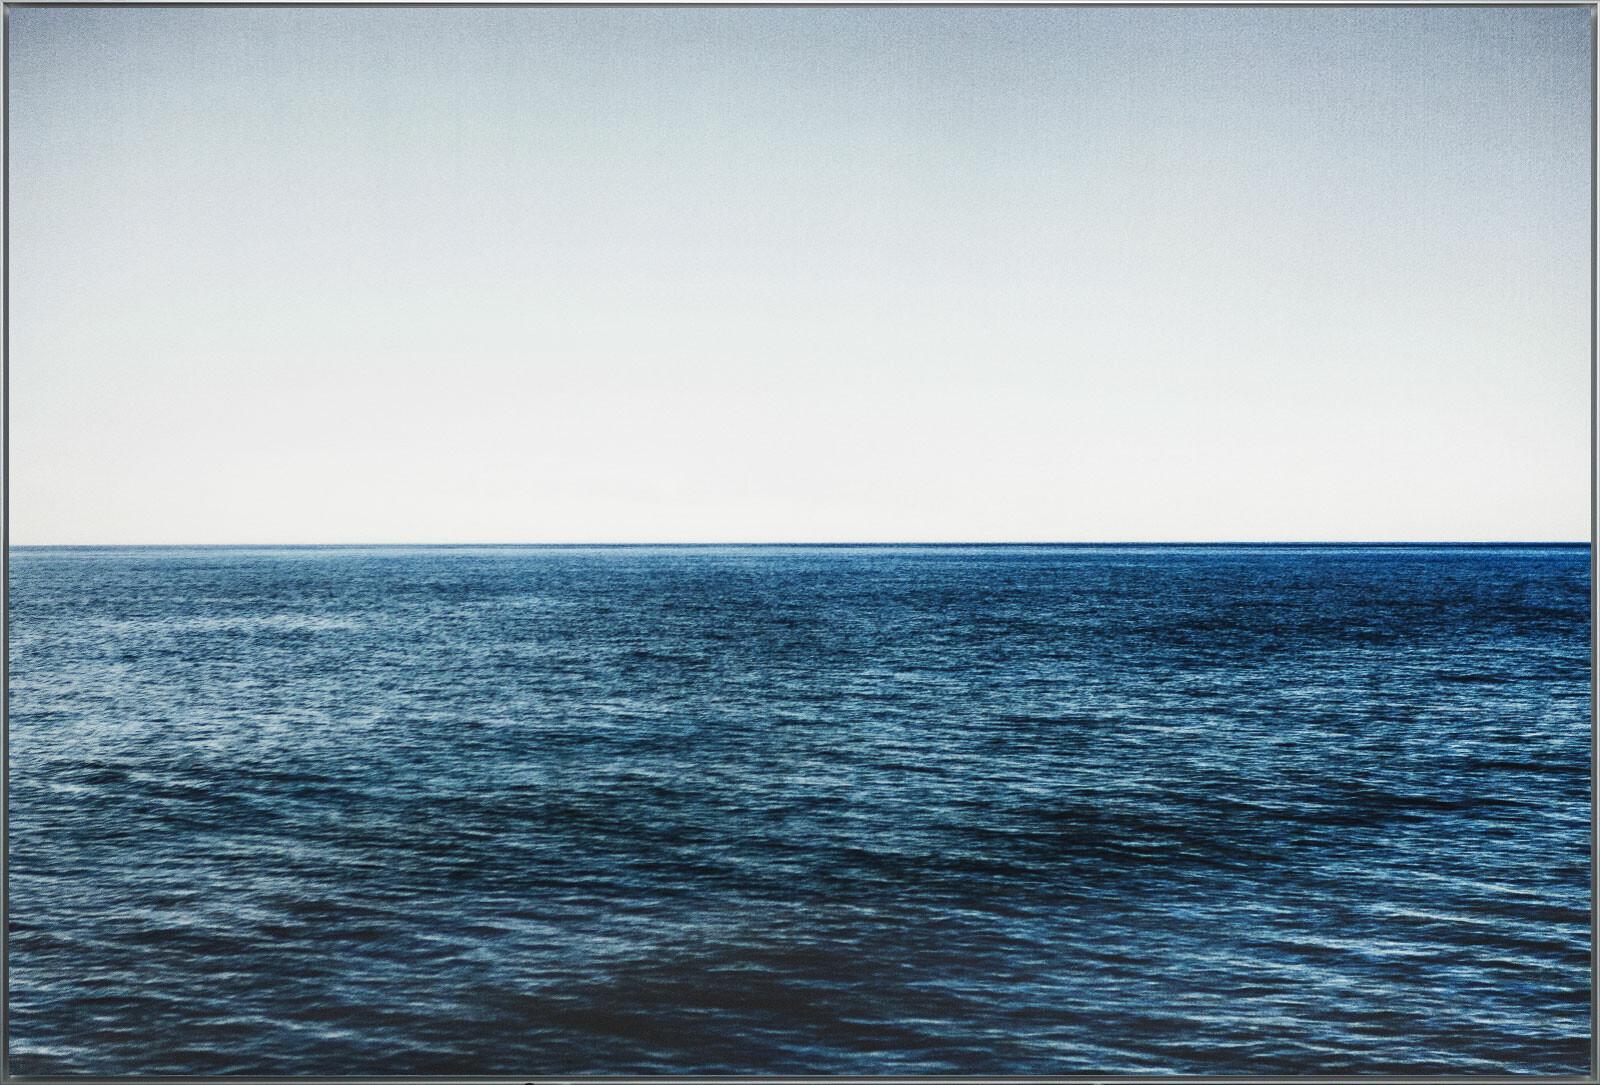 Seesaw Seascape V - Wolfgang Uhlig